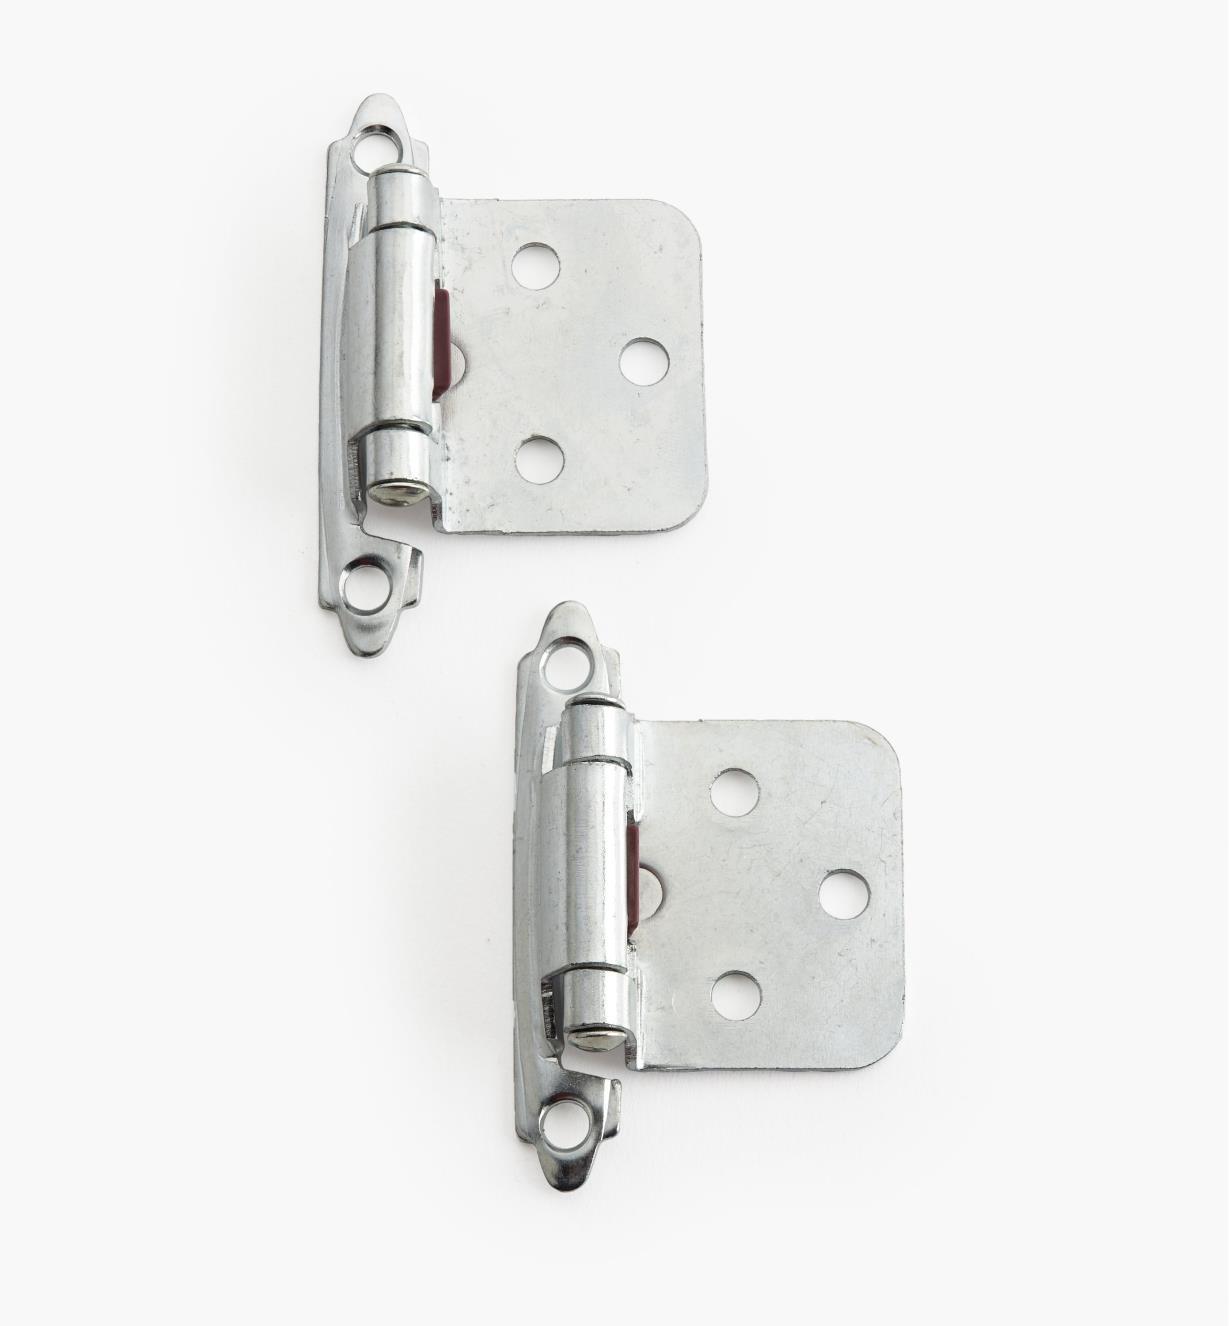 02H1344 - Chrome Plate Flush-Mount Self-Closing Hinges, pair